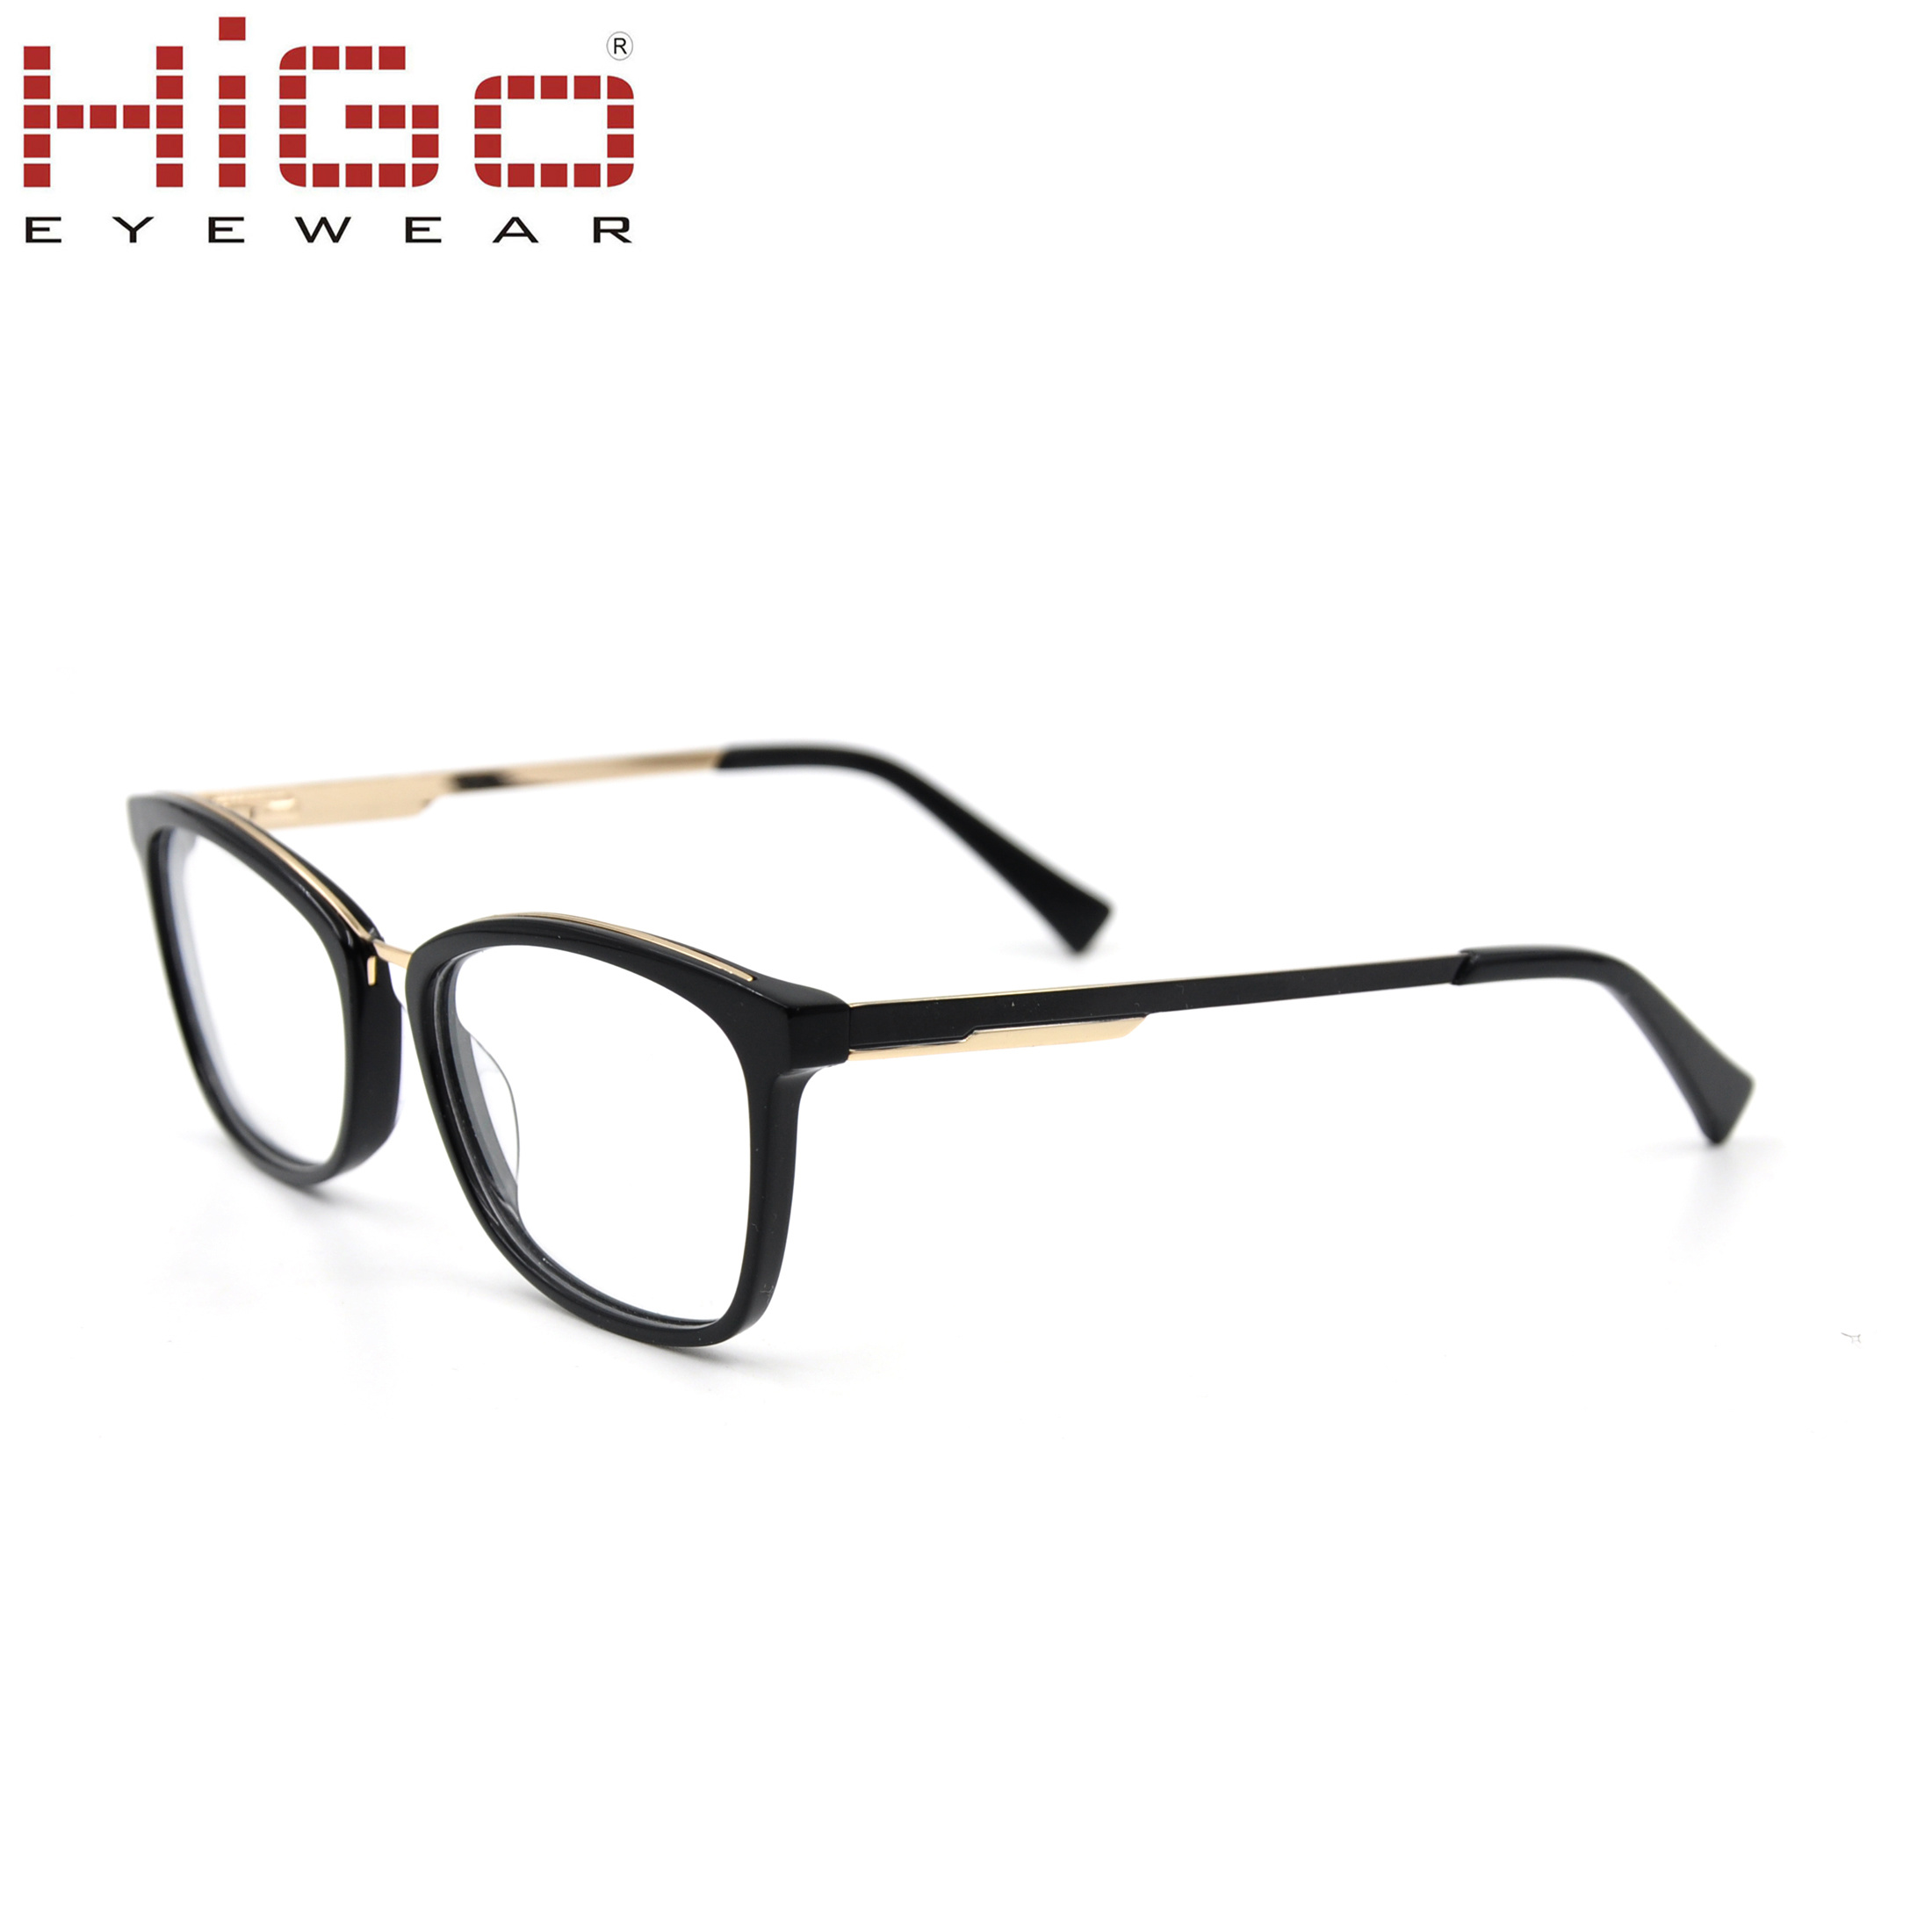 51738e6ae5 China New Arrived Latest Model Fashionable Spectacles Acetate Optical Frame  - China Acetate Frame